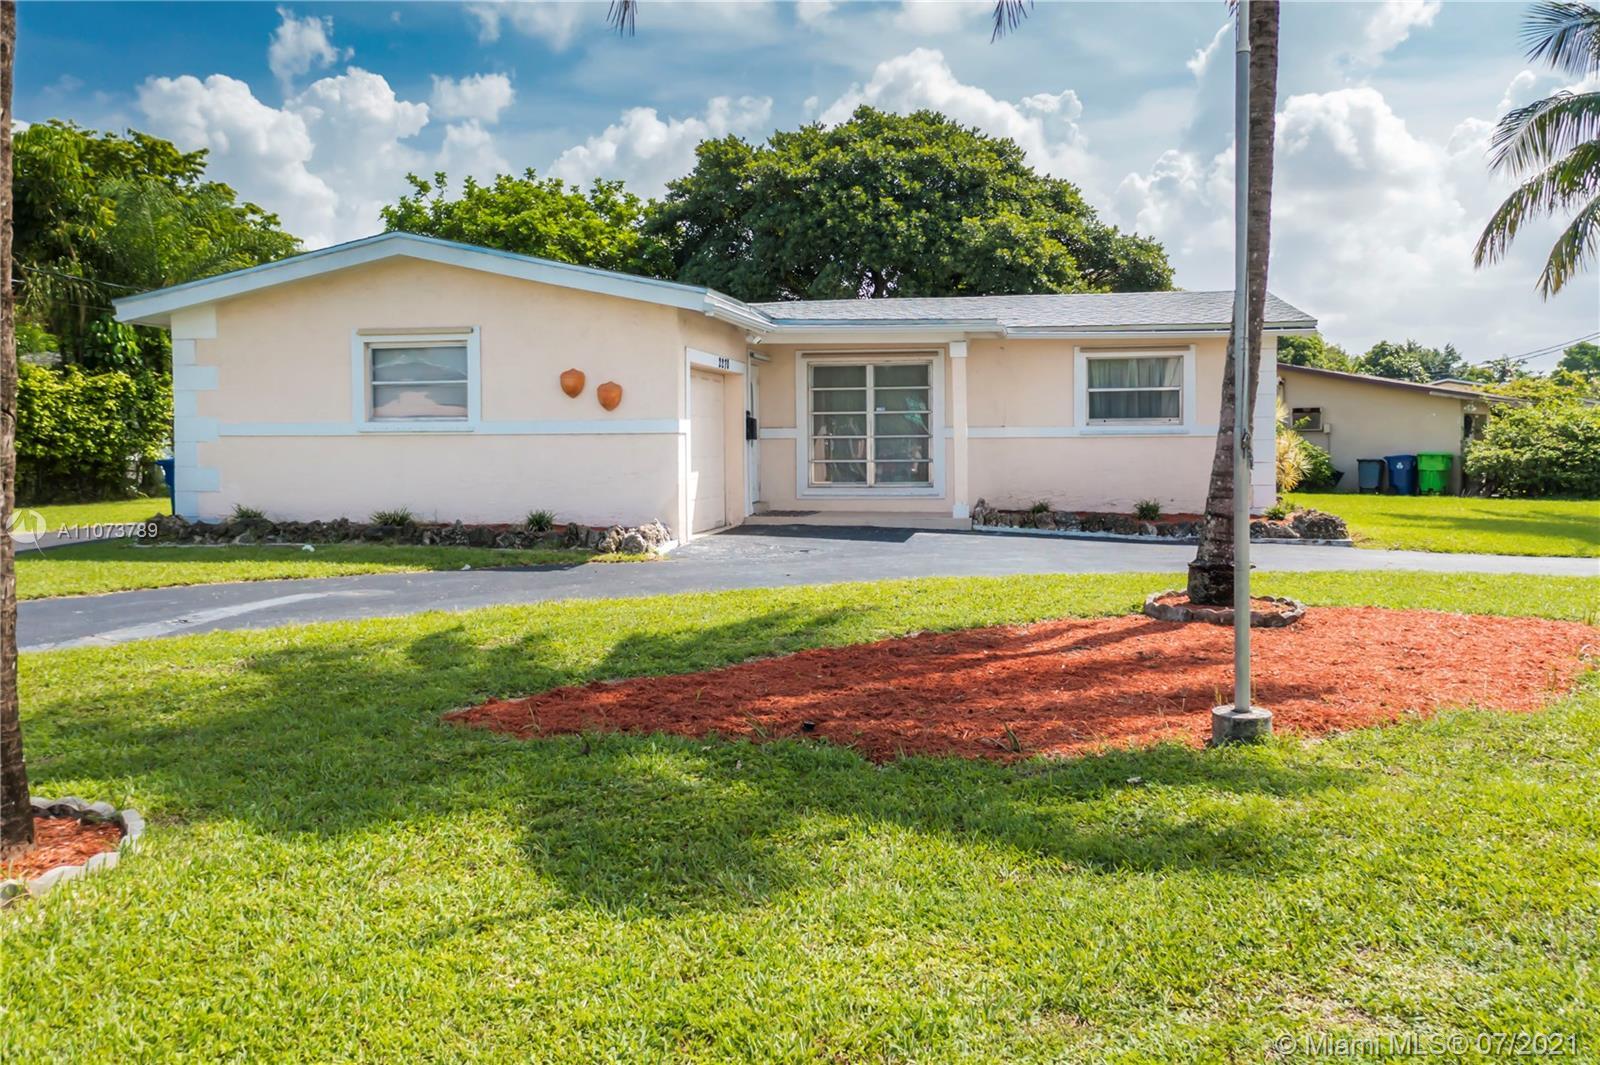 Sunrise Golf Village - 2270 NW 74th Ave, Sunrise, FL 33313